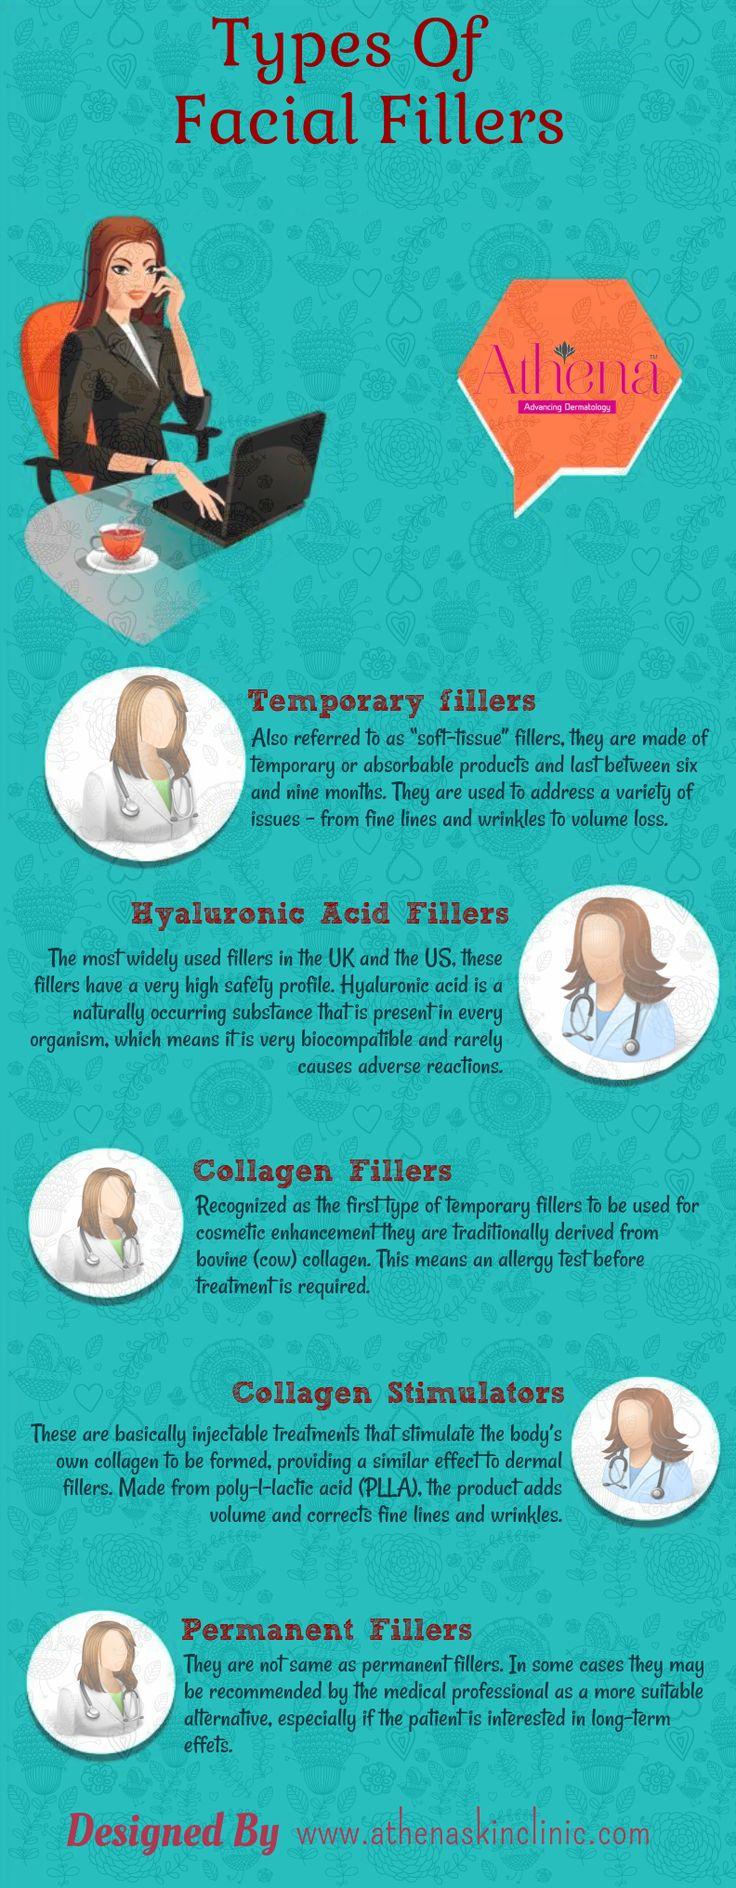 17 Best Ideas About Facial Fillers On Pinterest Dermal